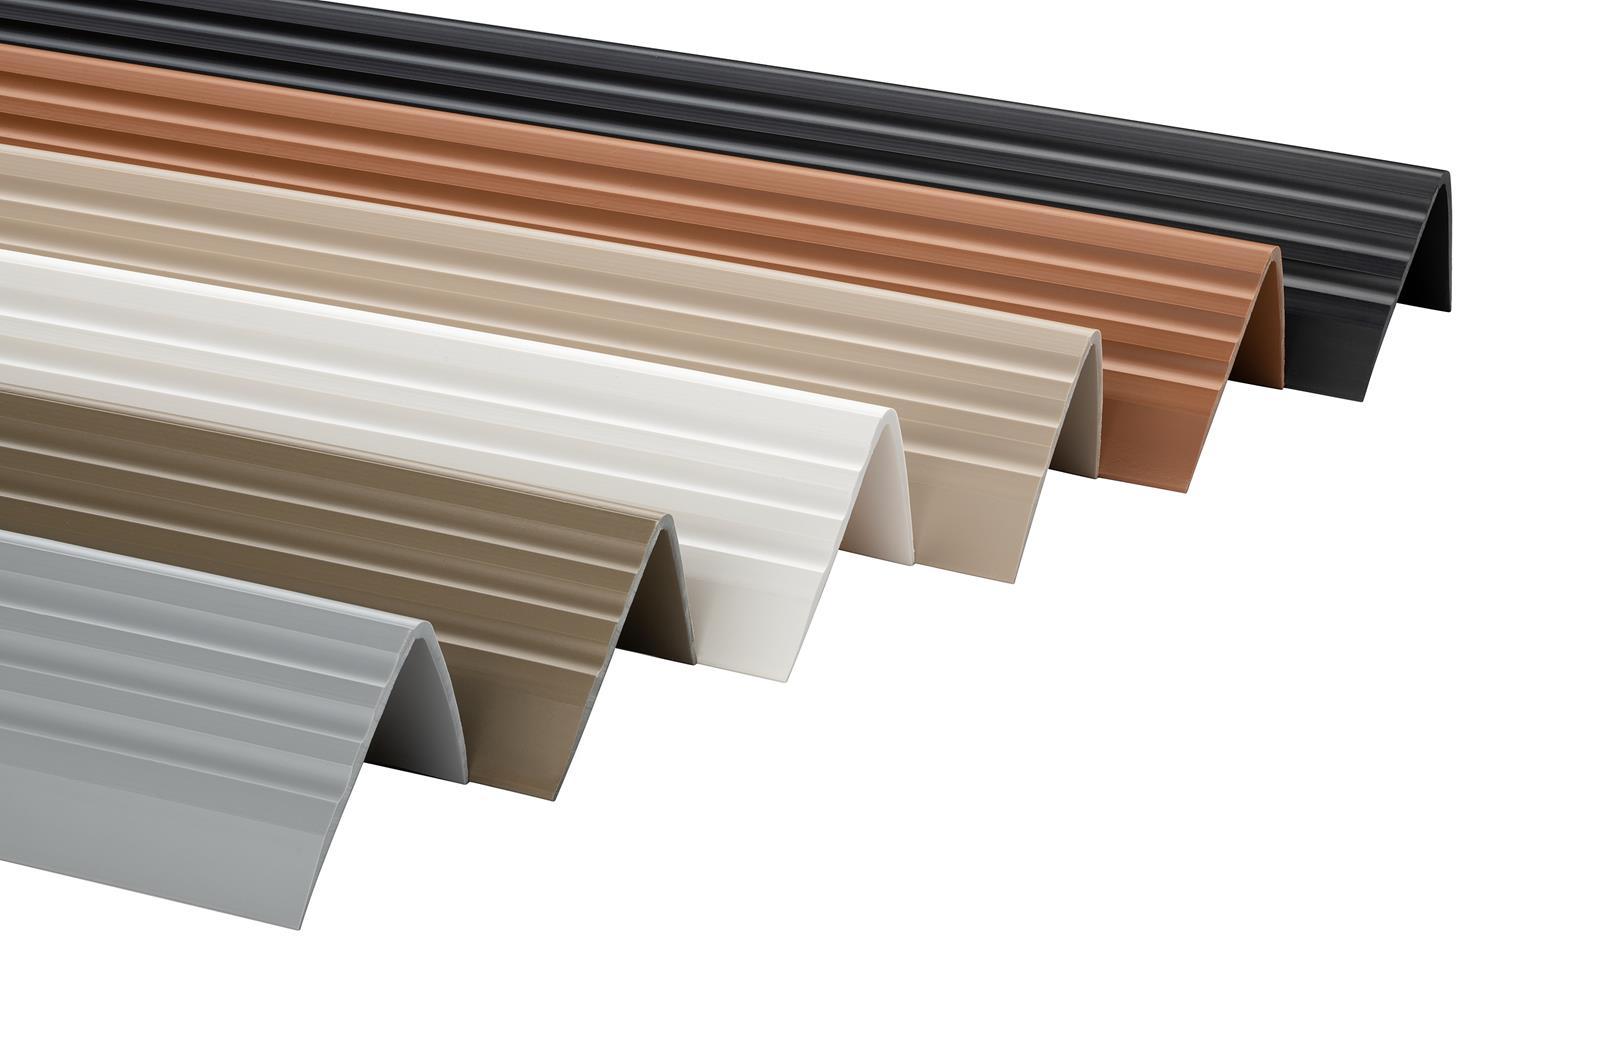 Treppenkantenprofil PVC Gummi SELBSTKLEBEND Vinyl Winkelprofil 50x42 RGP 100CM BEIGE